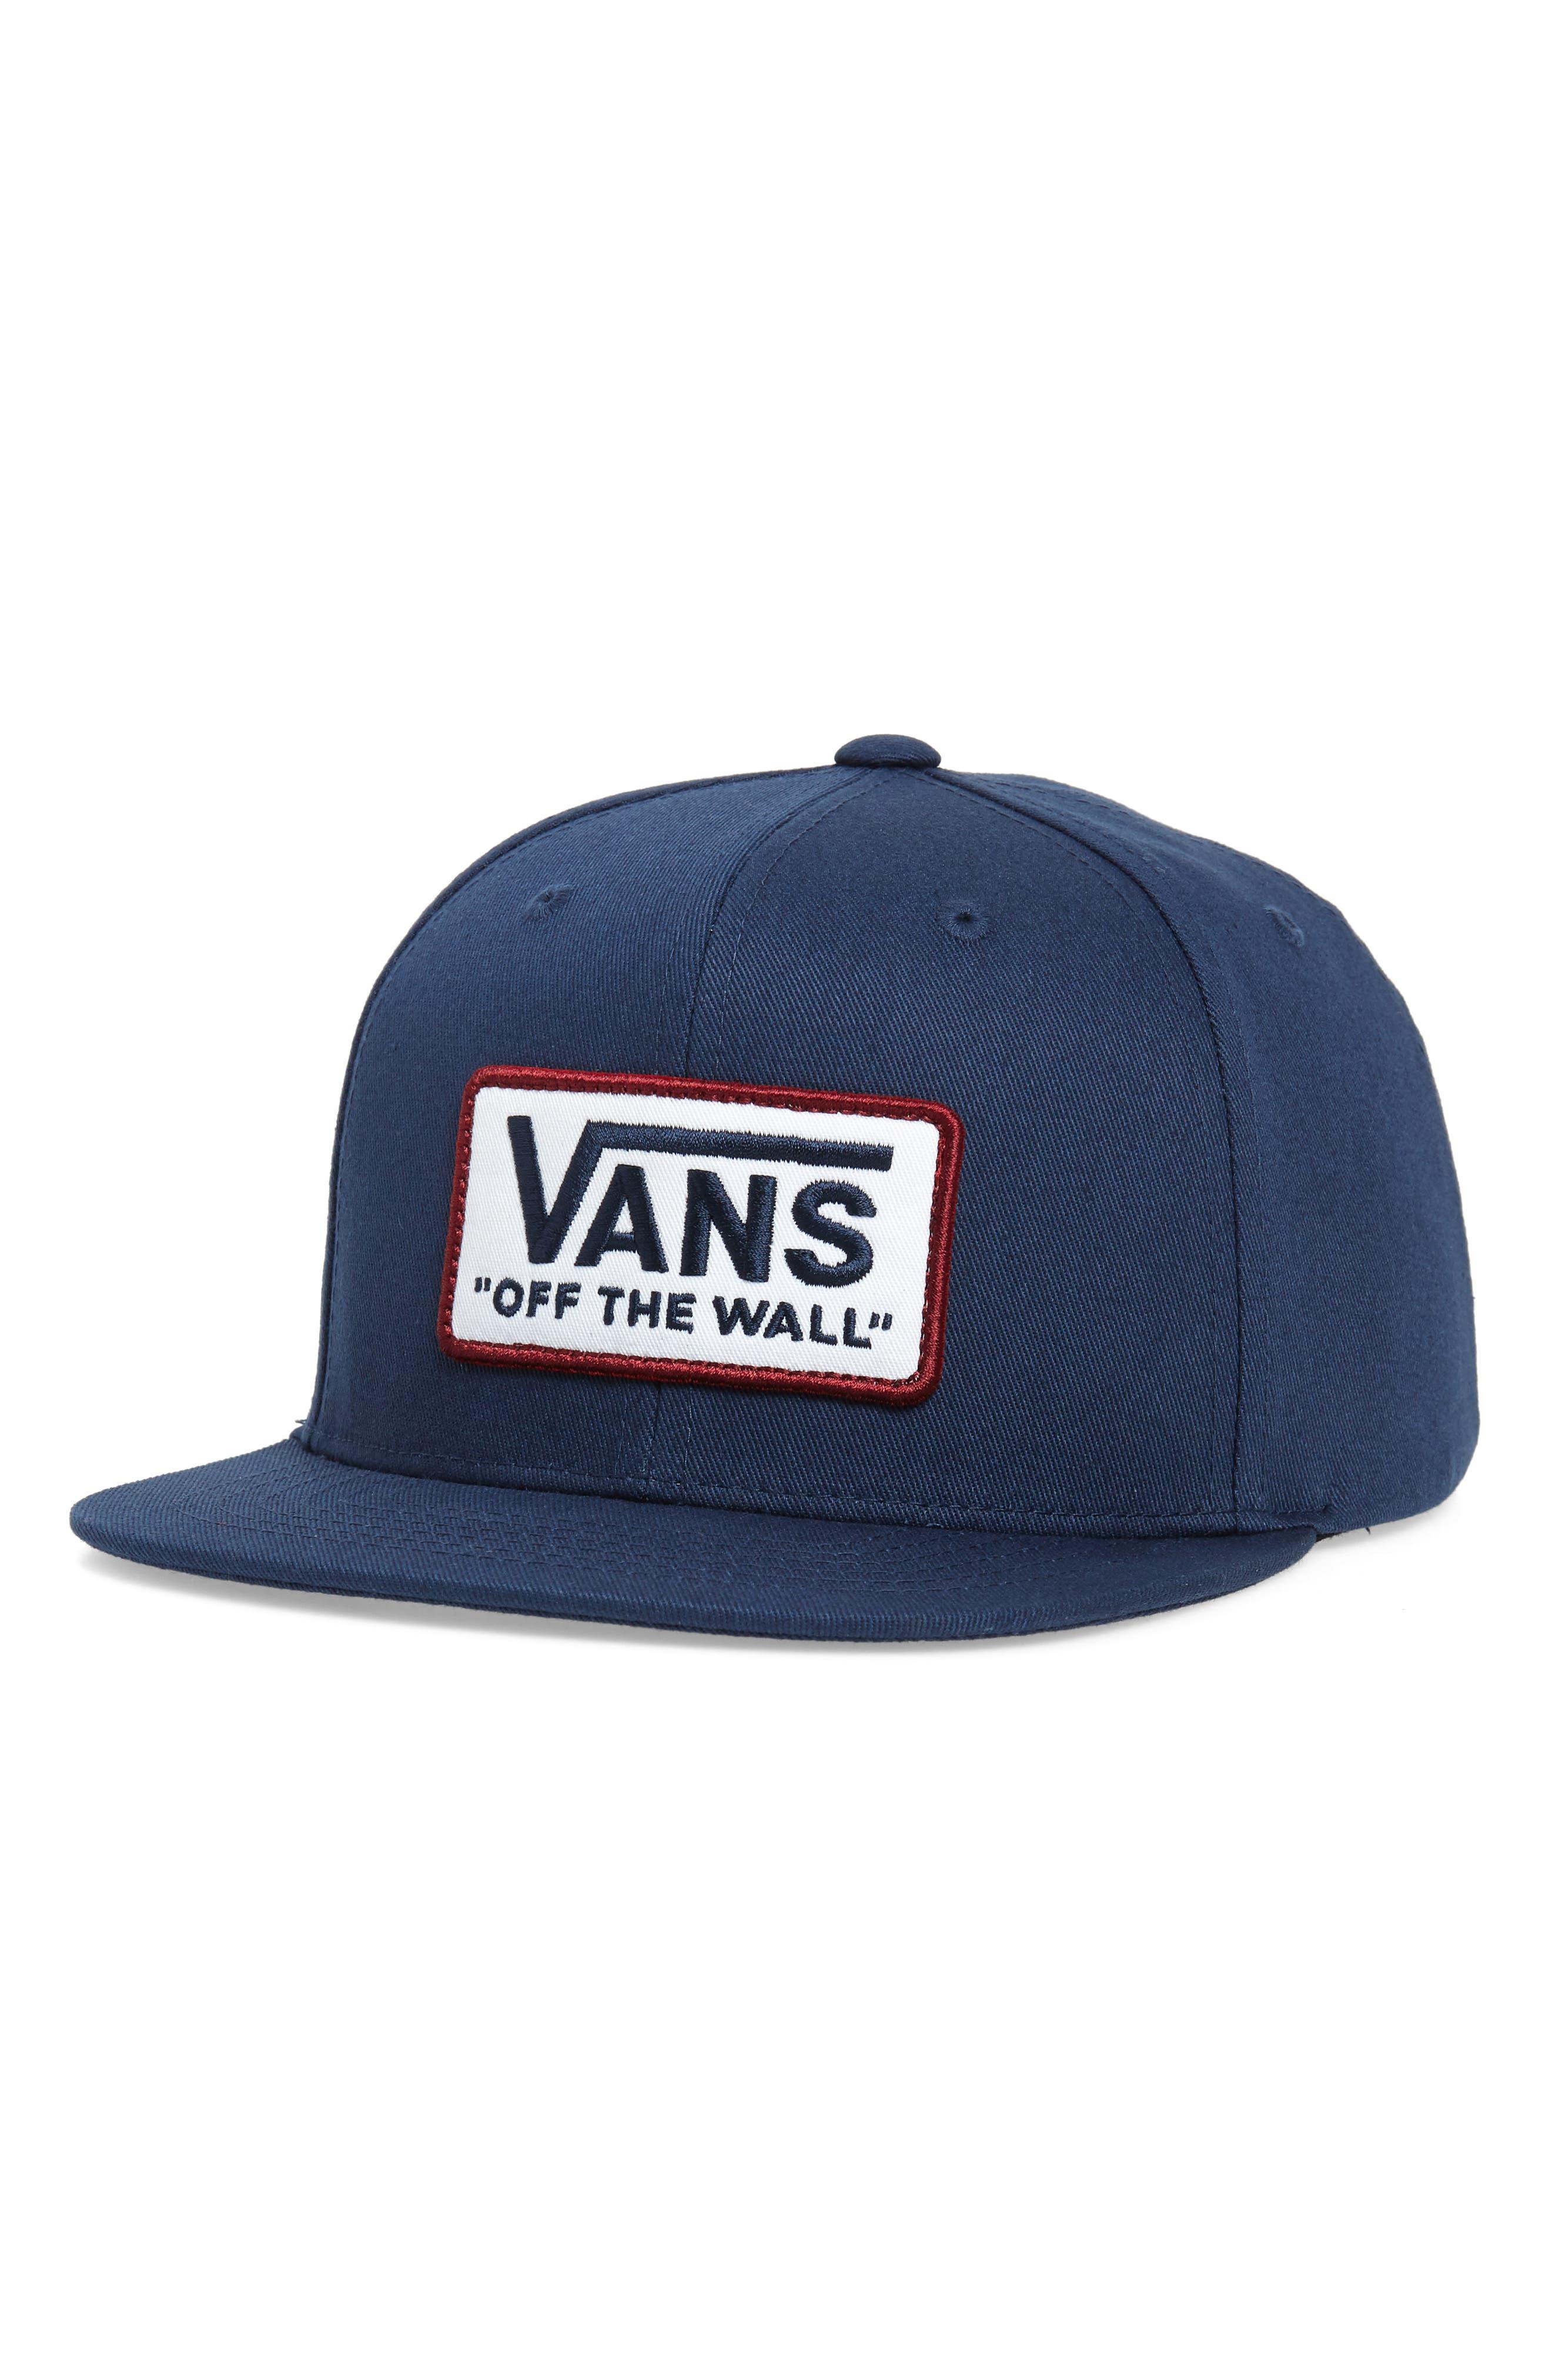 VANS,                             Whitford Snapback Hat,                             Main thumbnail 1, color,                             DRESS BLUES